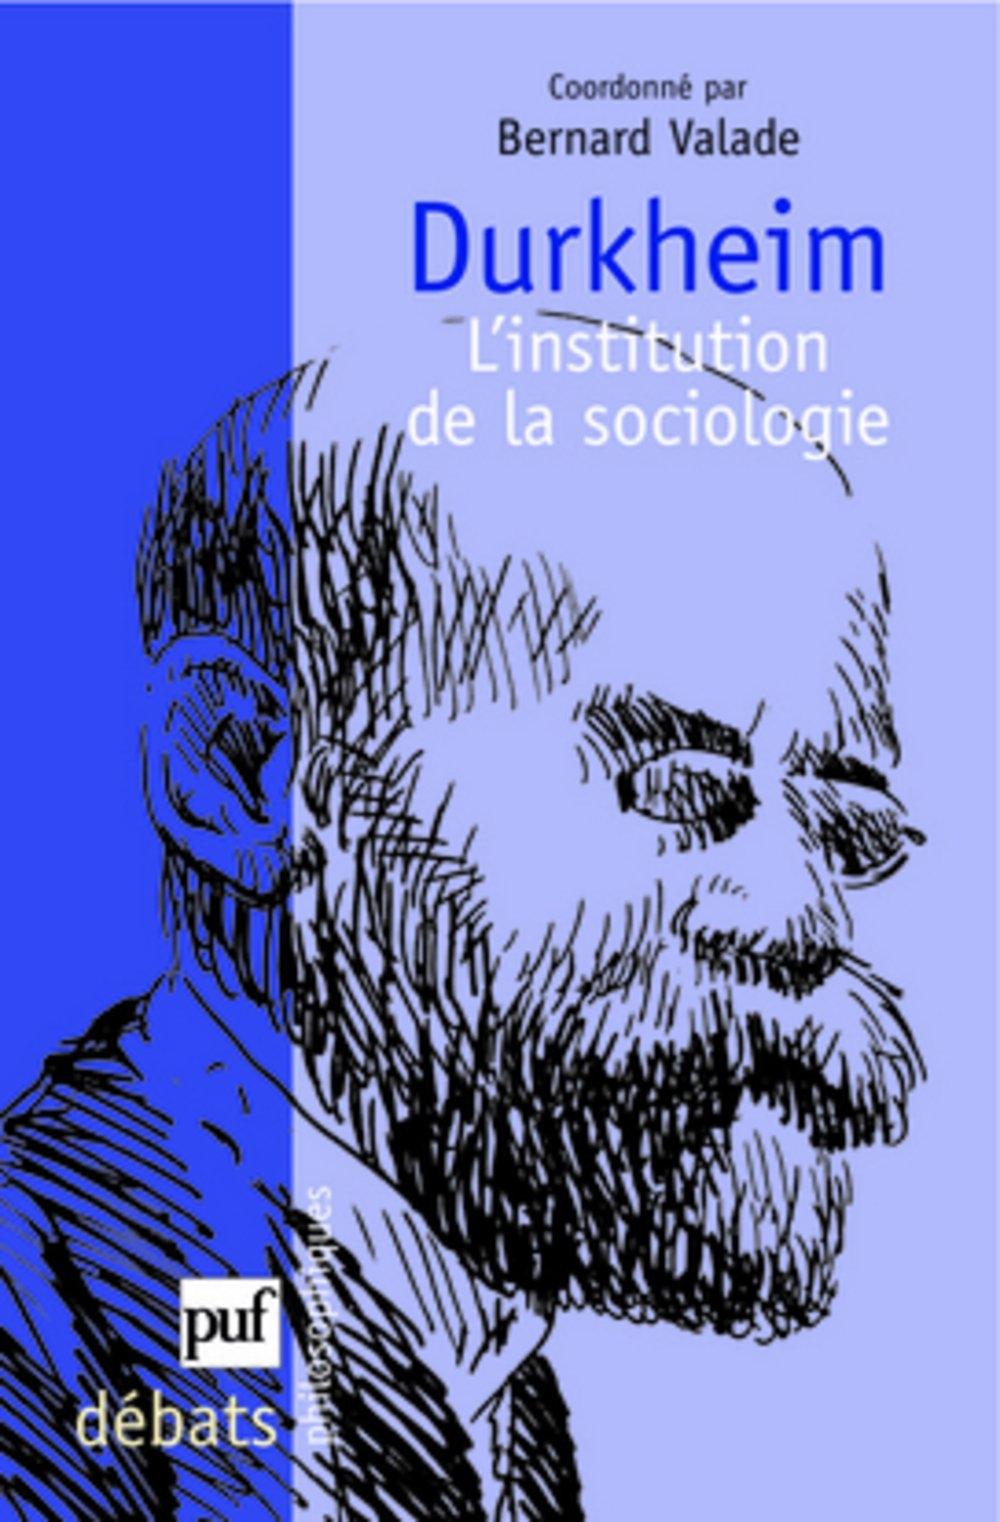 Durkheim, l'institution de la sociologie